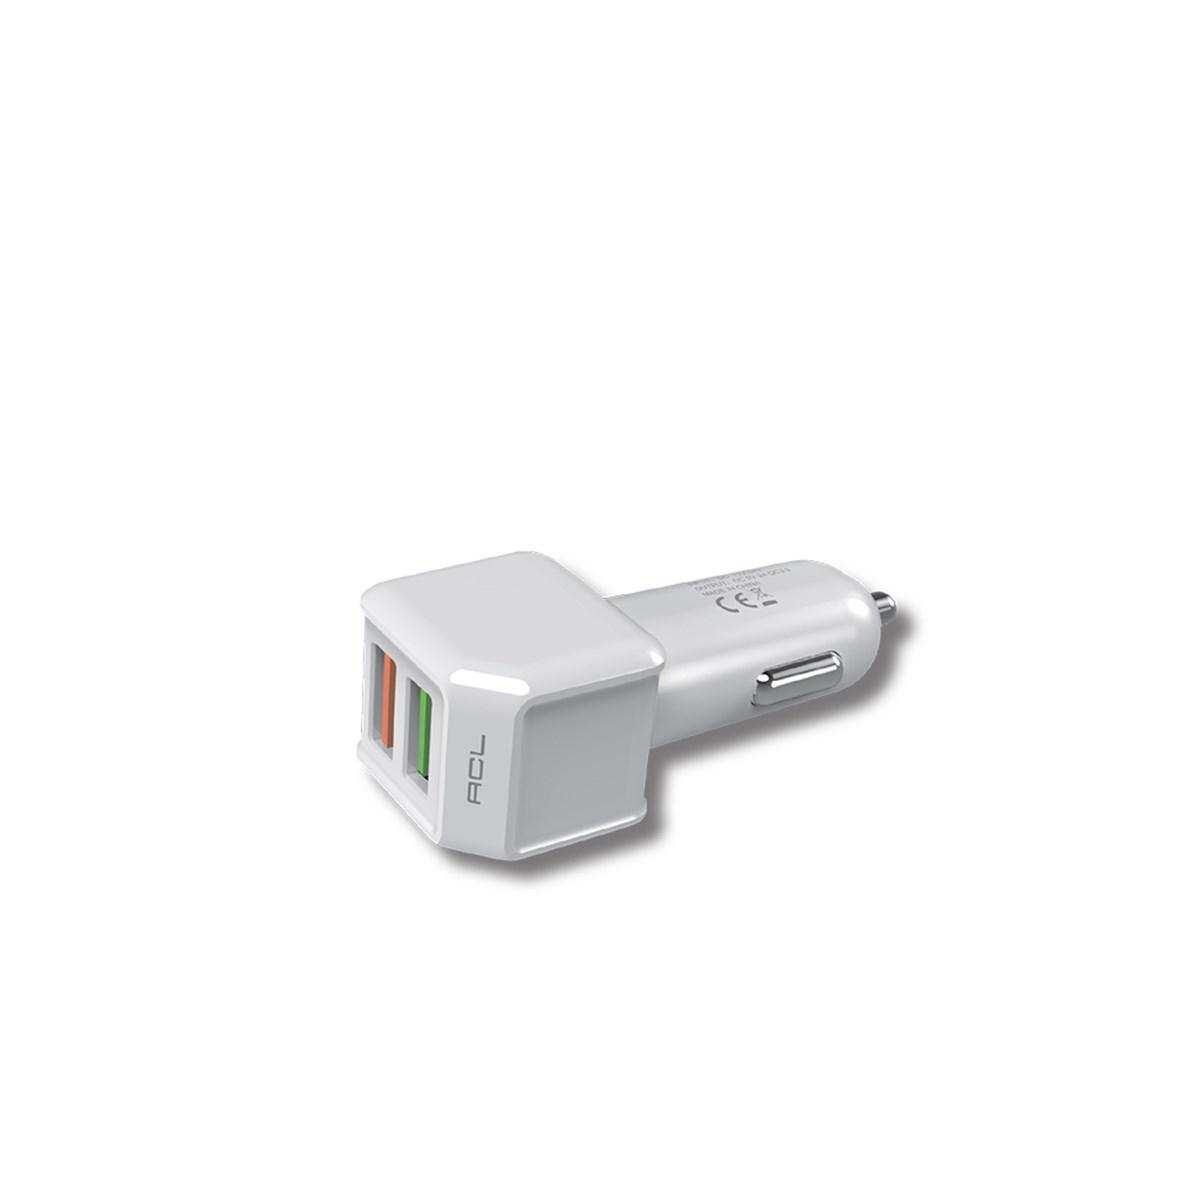 PowerIQ Series 3.0A Araç İçi Şarj Aleti Micro USB Kablolu